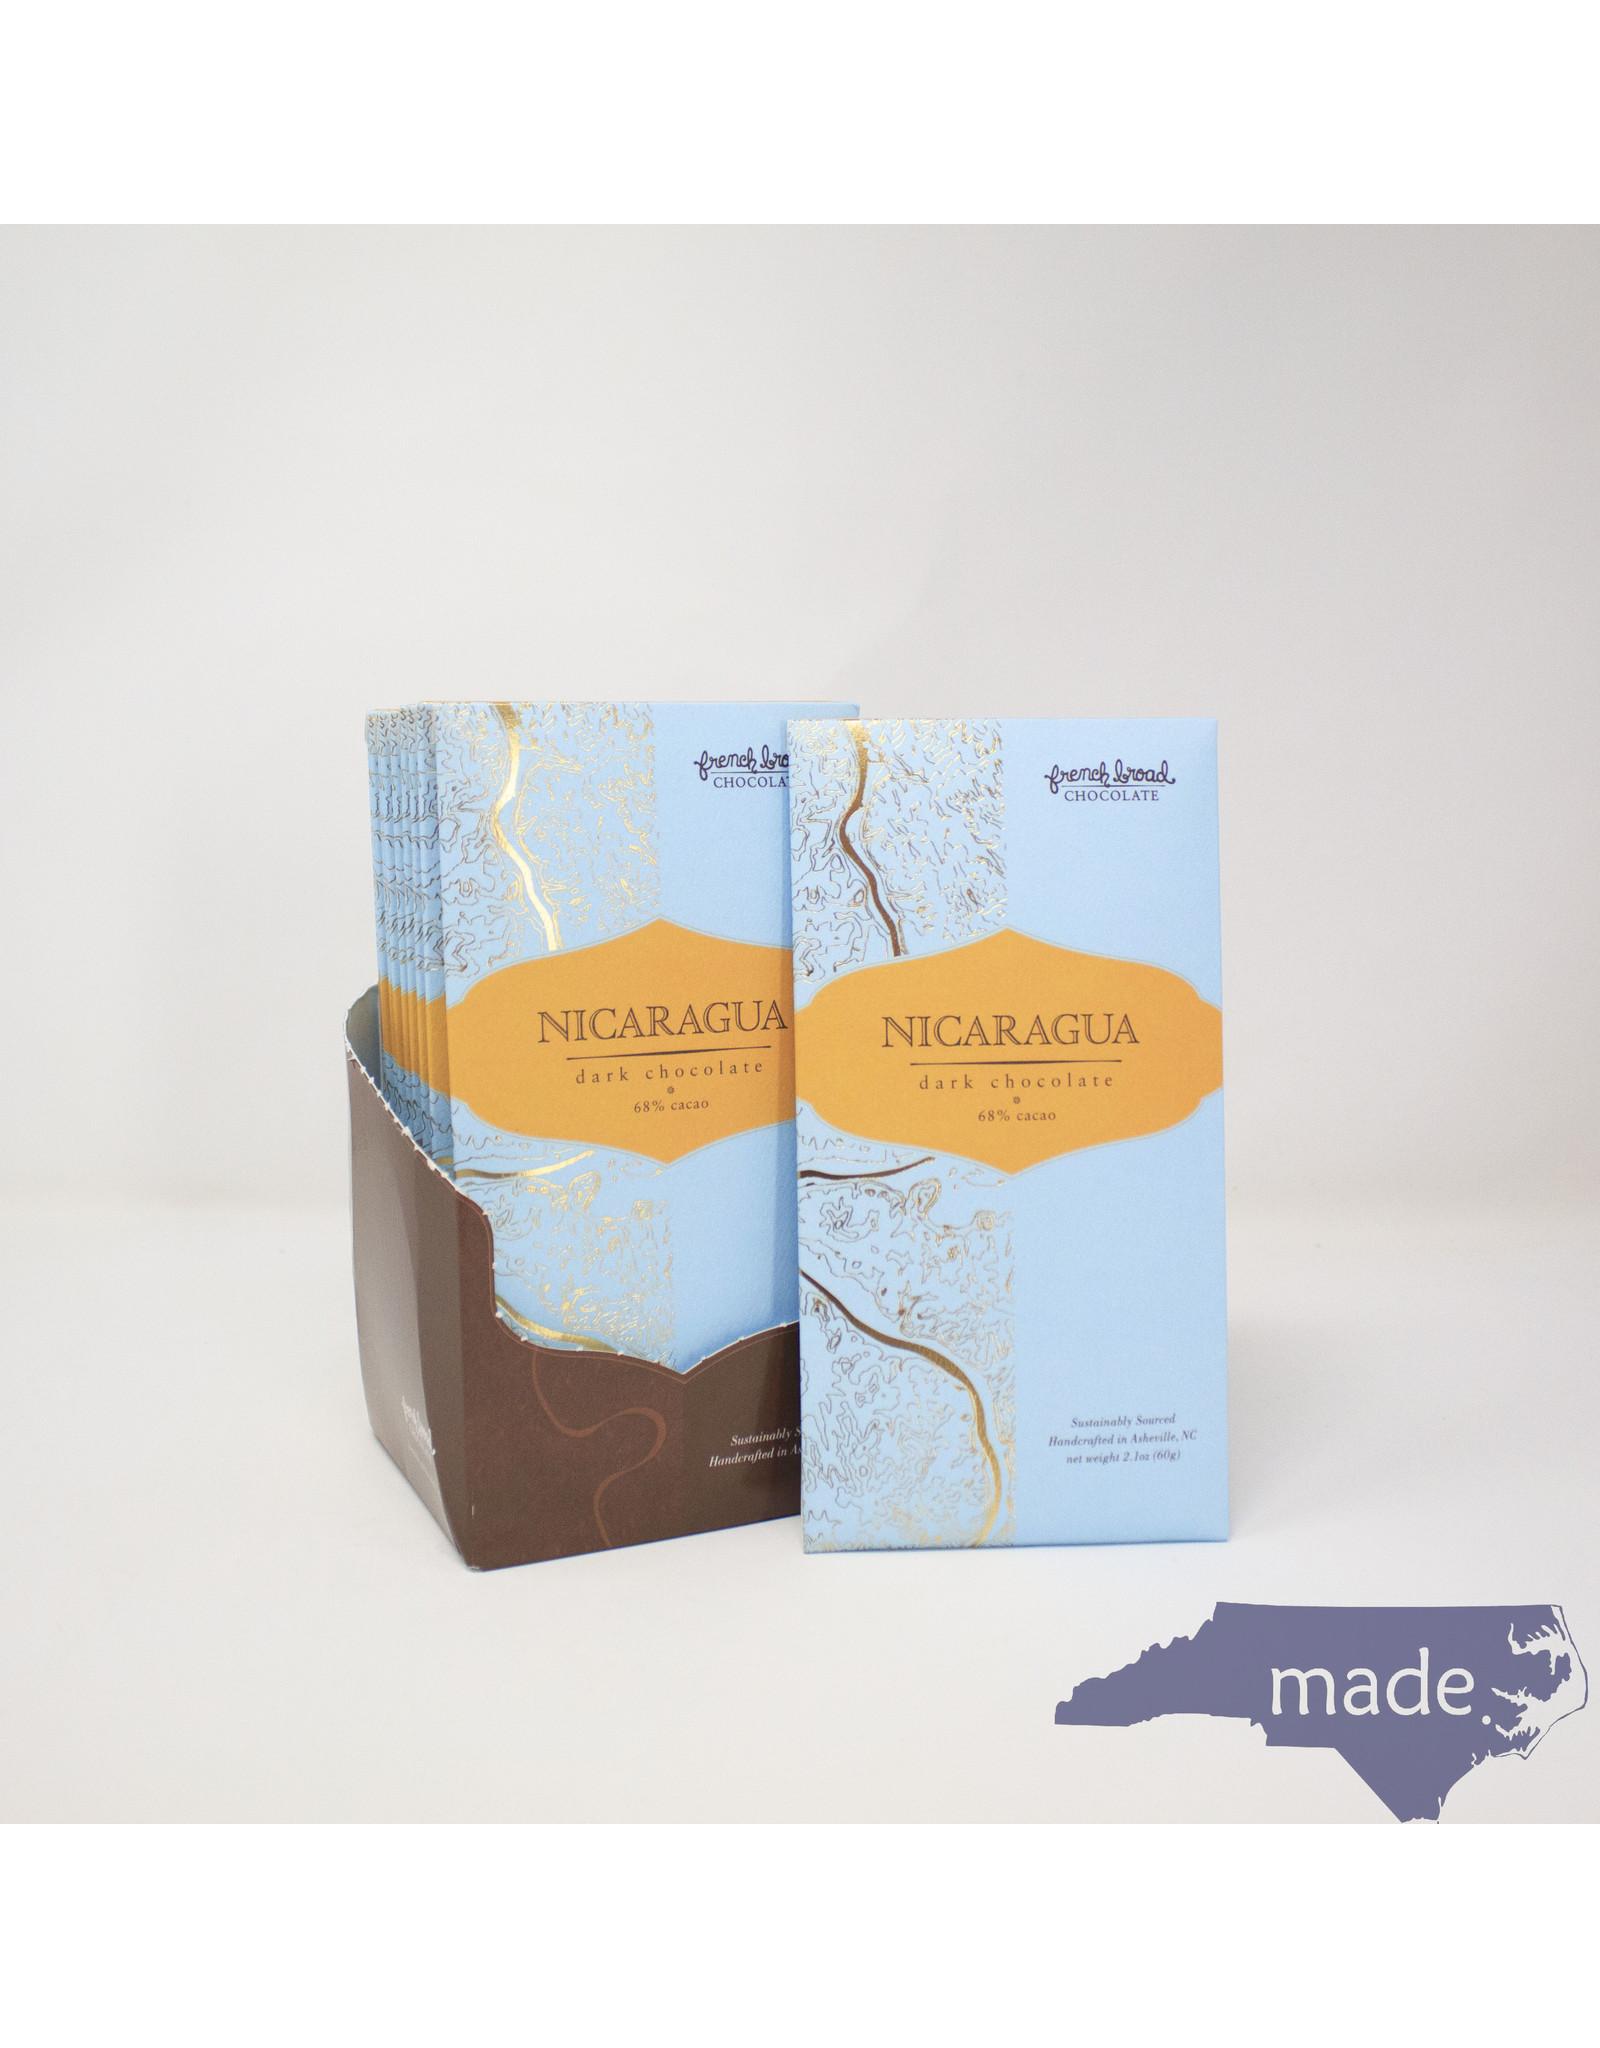 French Broad Chocolate Nicaragua Dark Chocolate - French Broad Chocolate